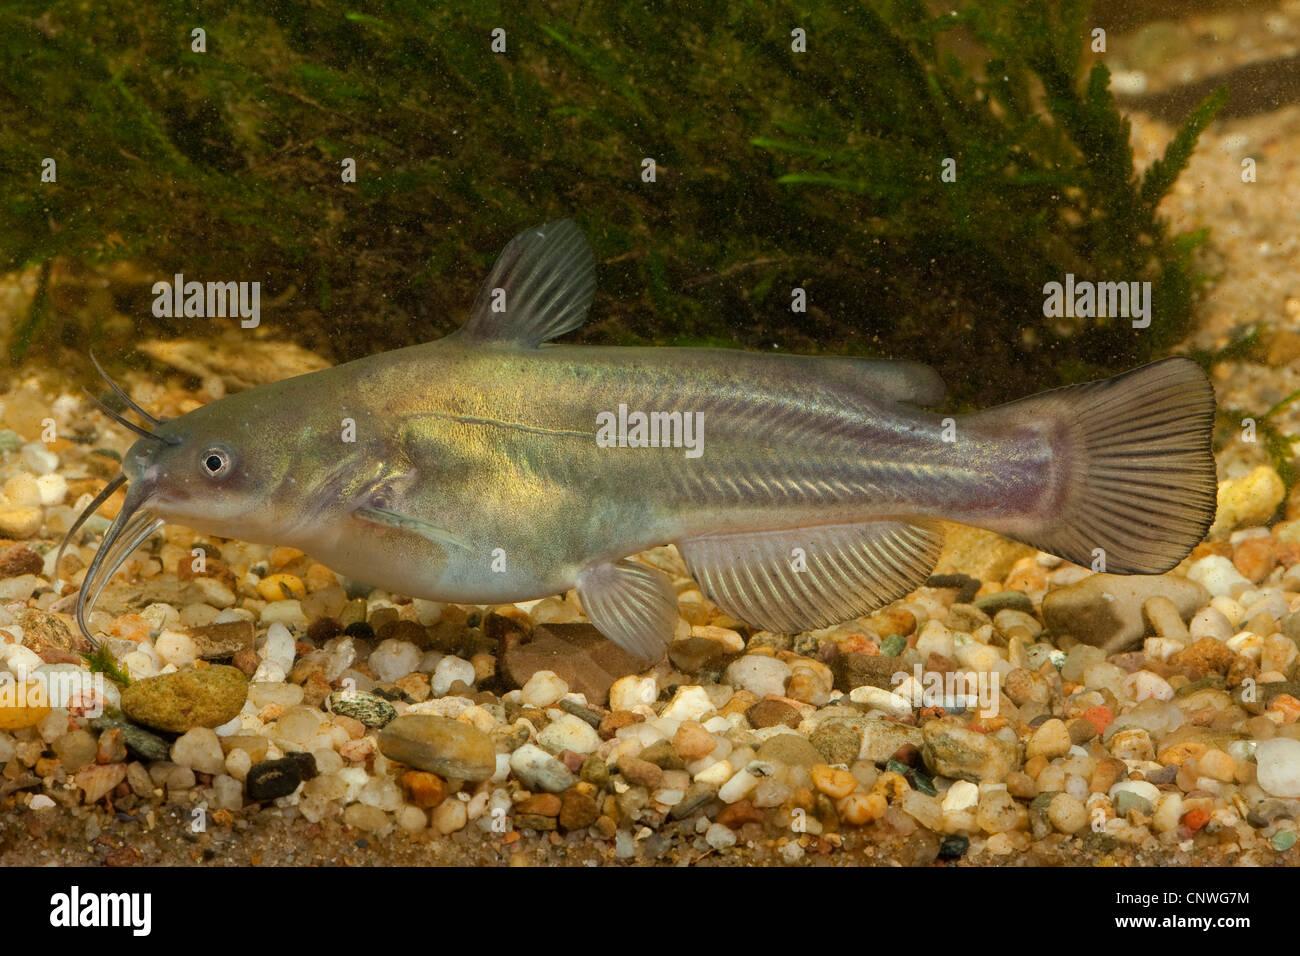 North American freshwater catfishes (Ictaluridae), close to gravel ground - Stock Image